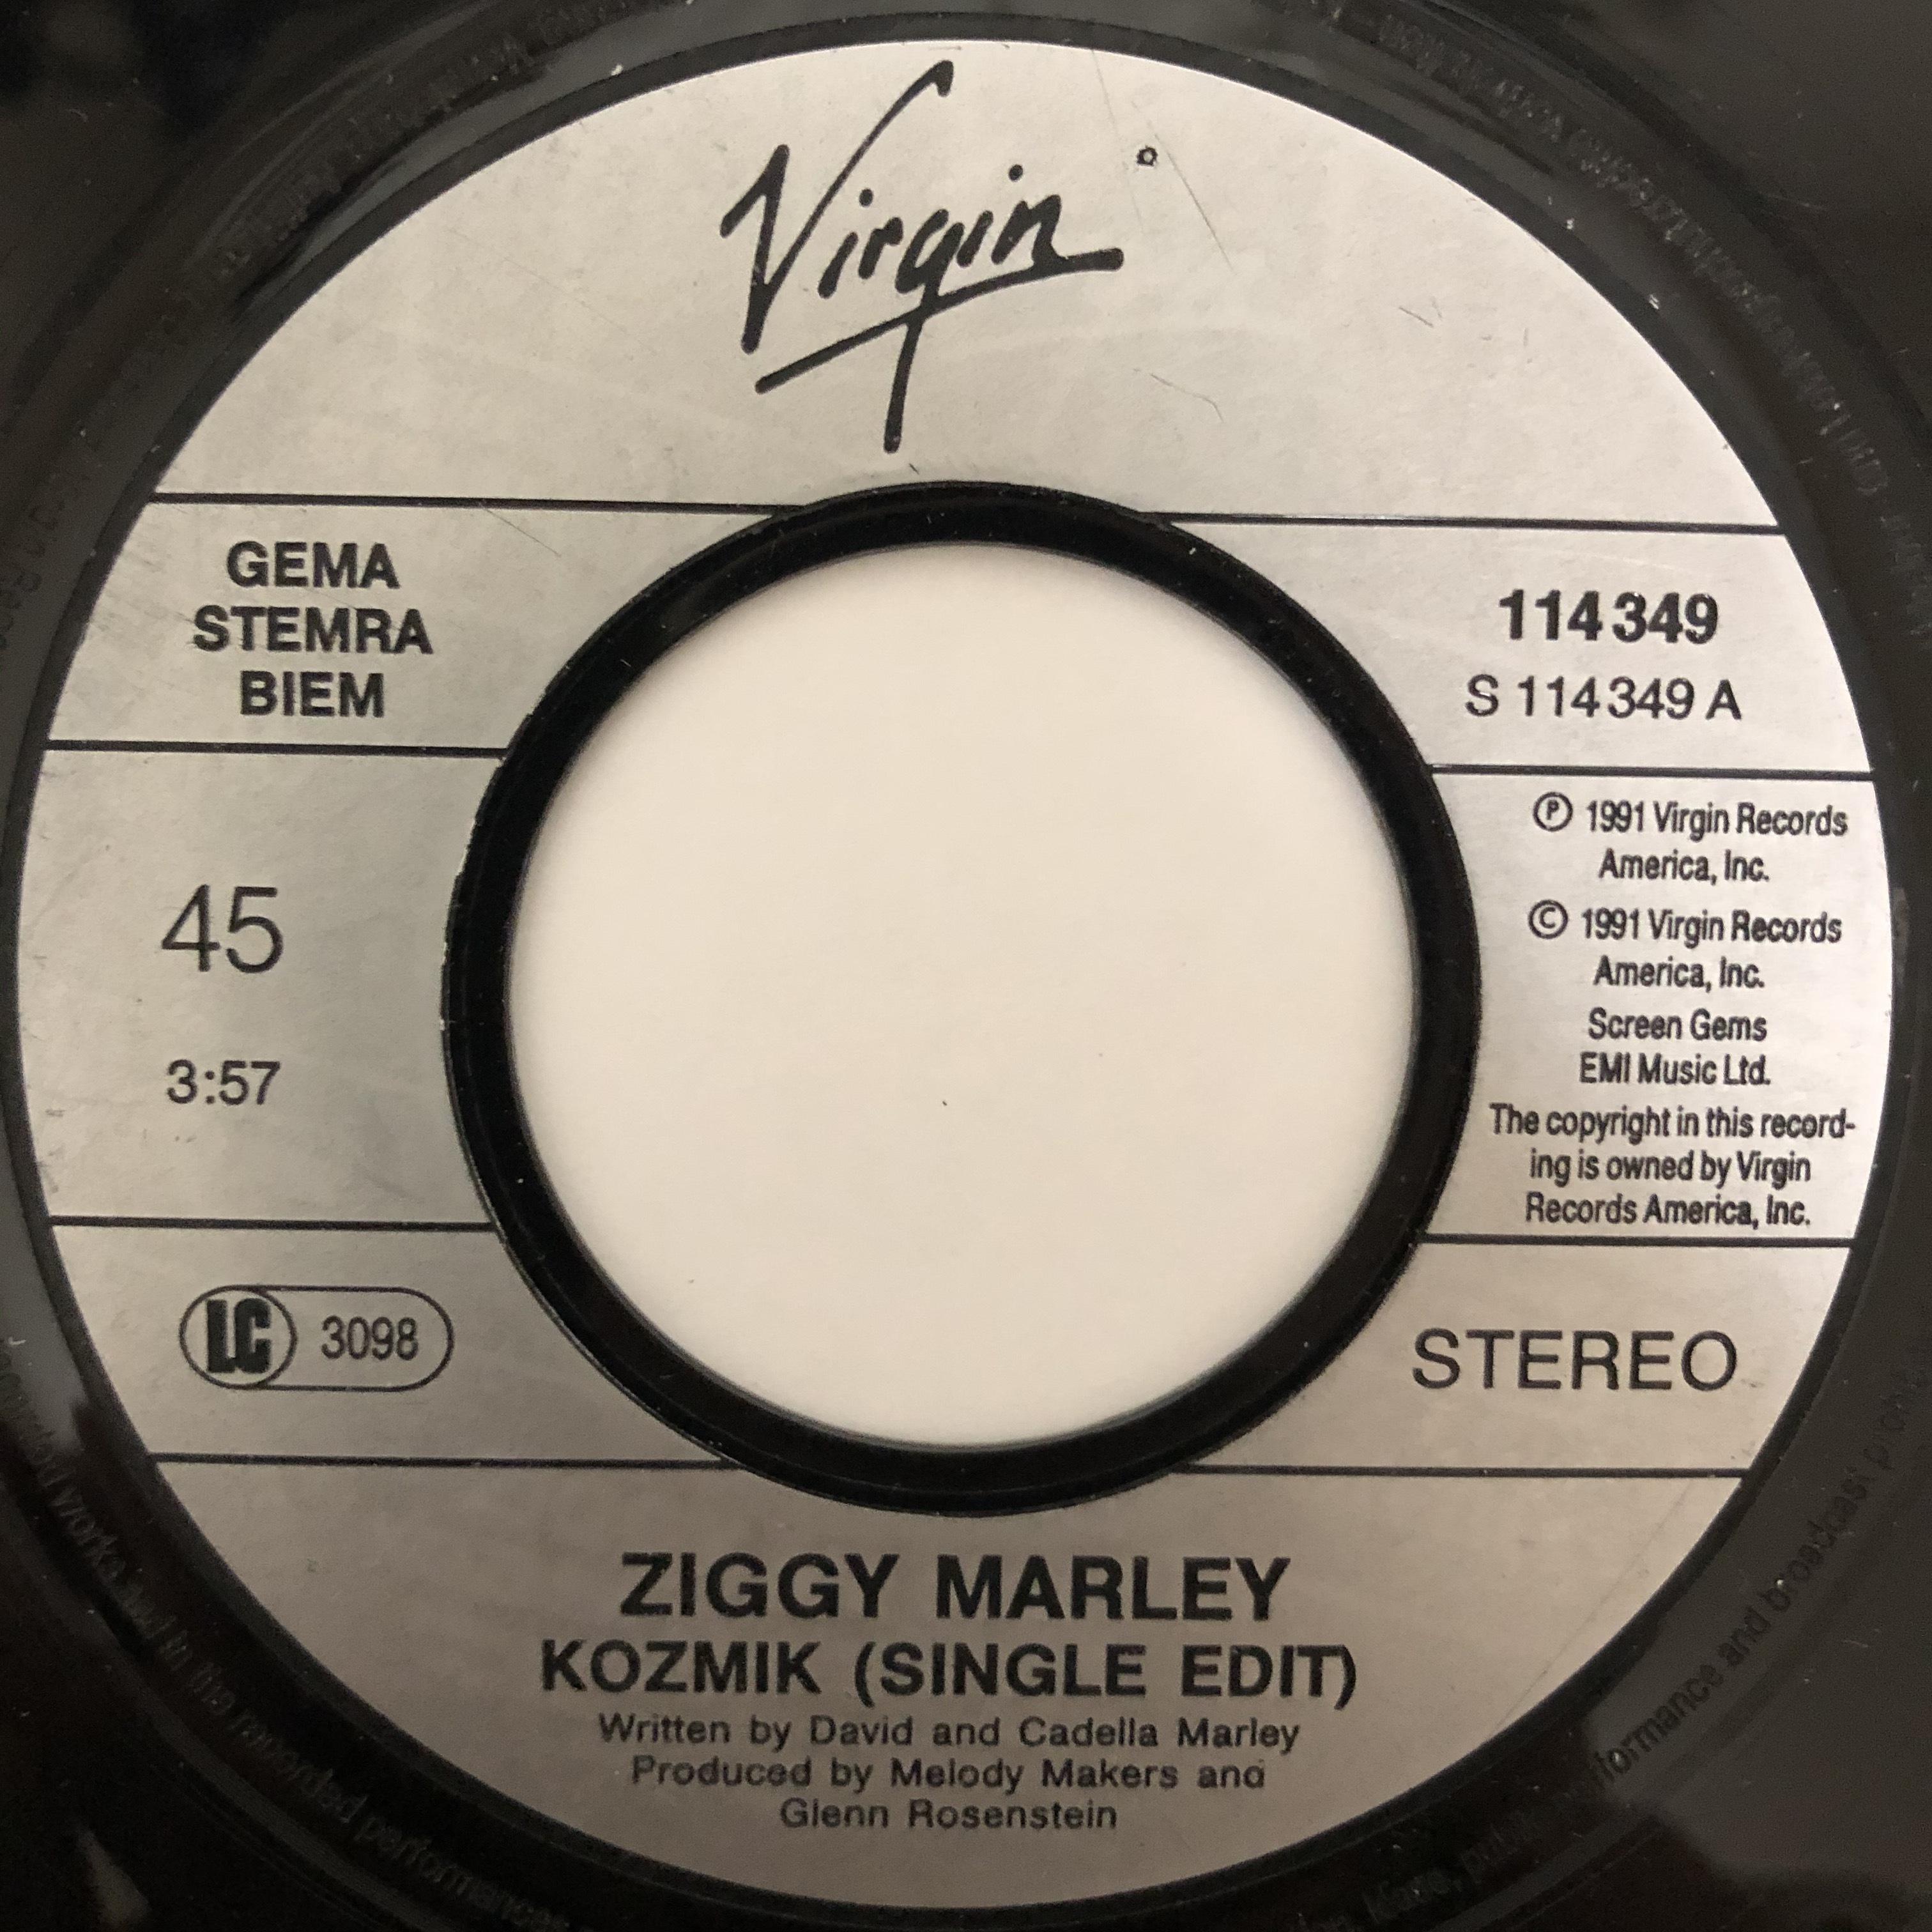 Ziggy Marley - Kozmik【7-20414】